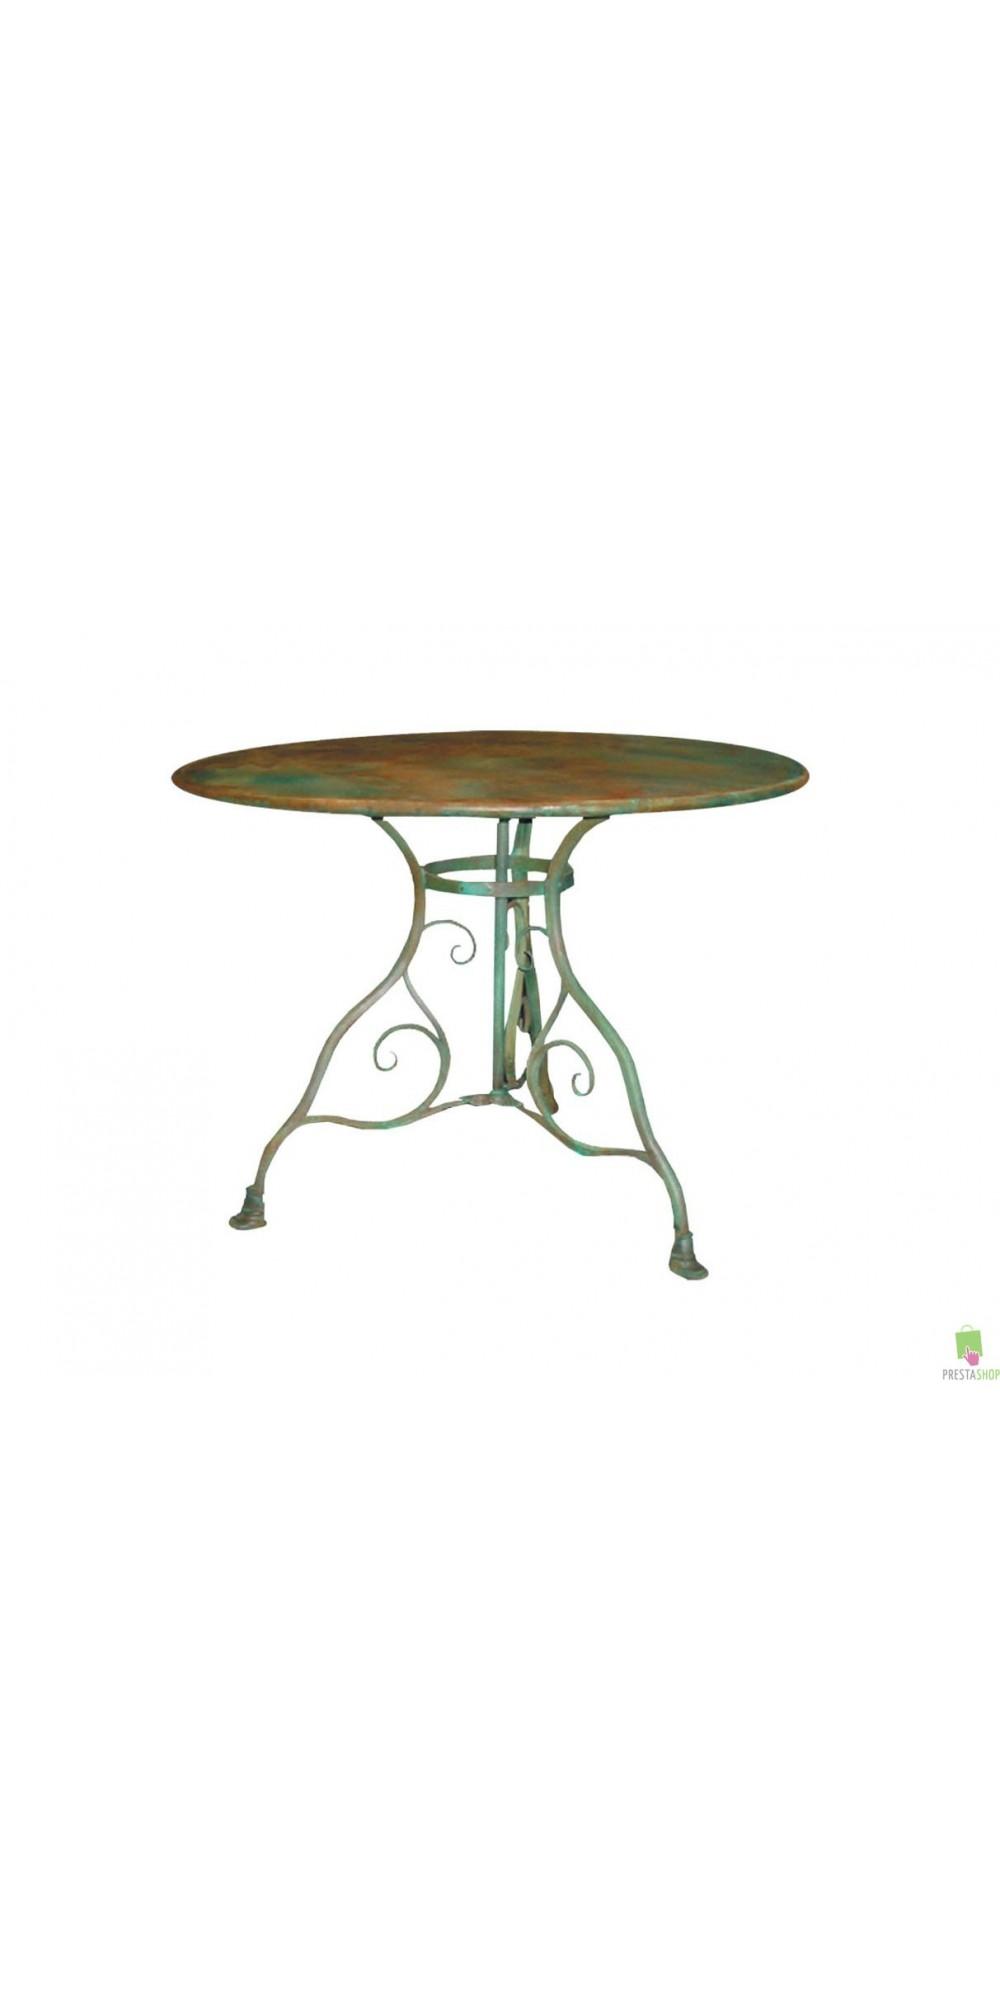 TABLE ARRAS